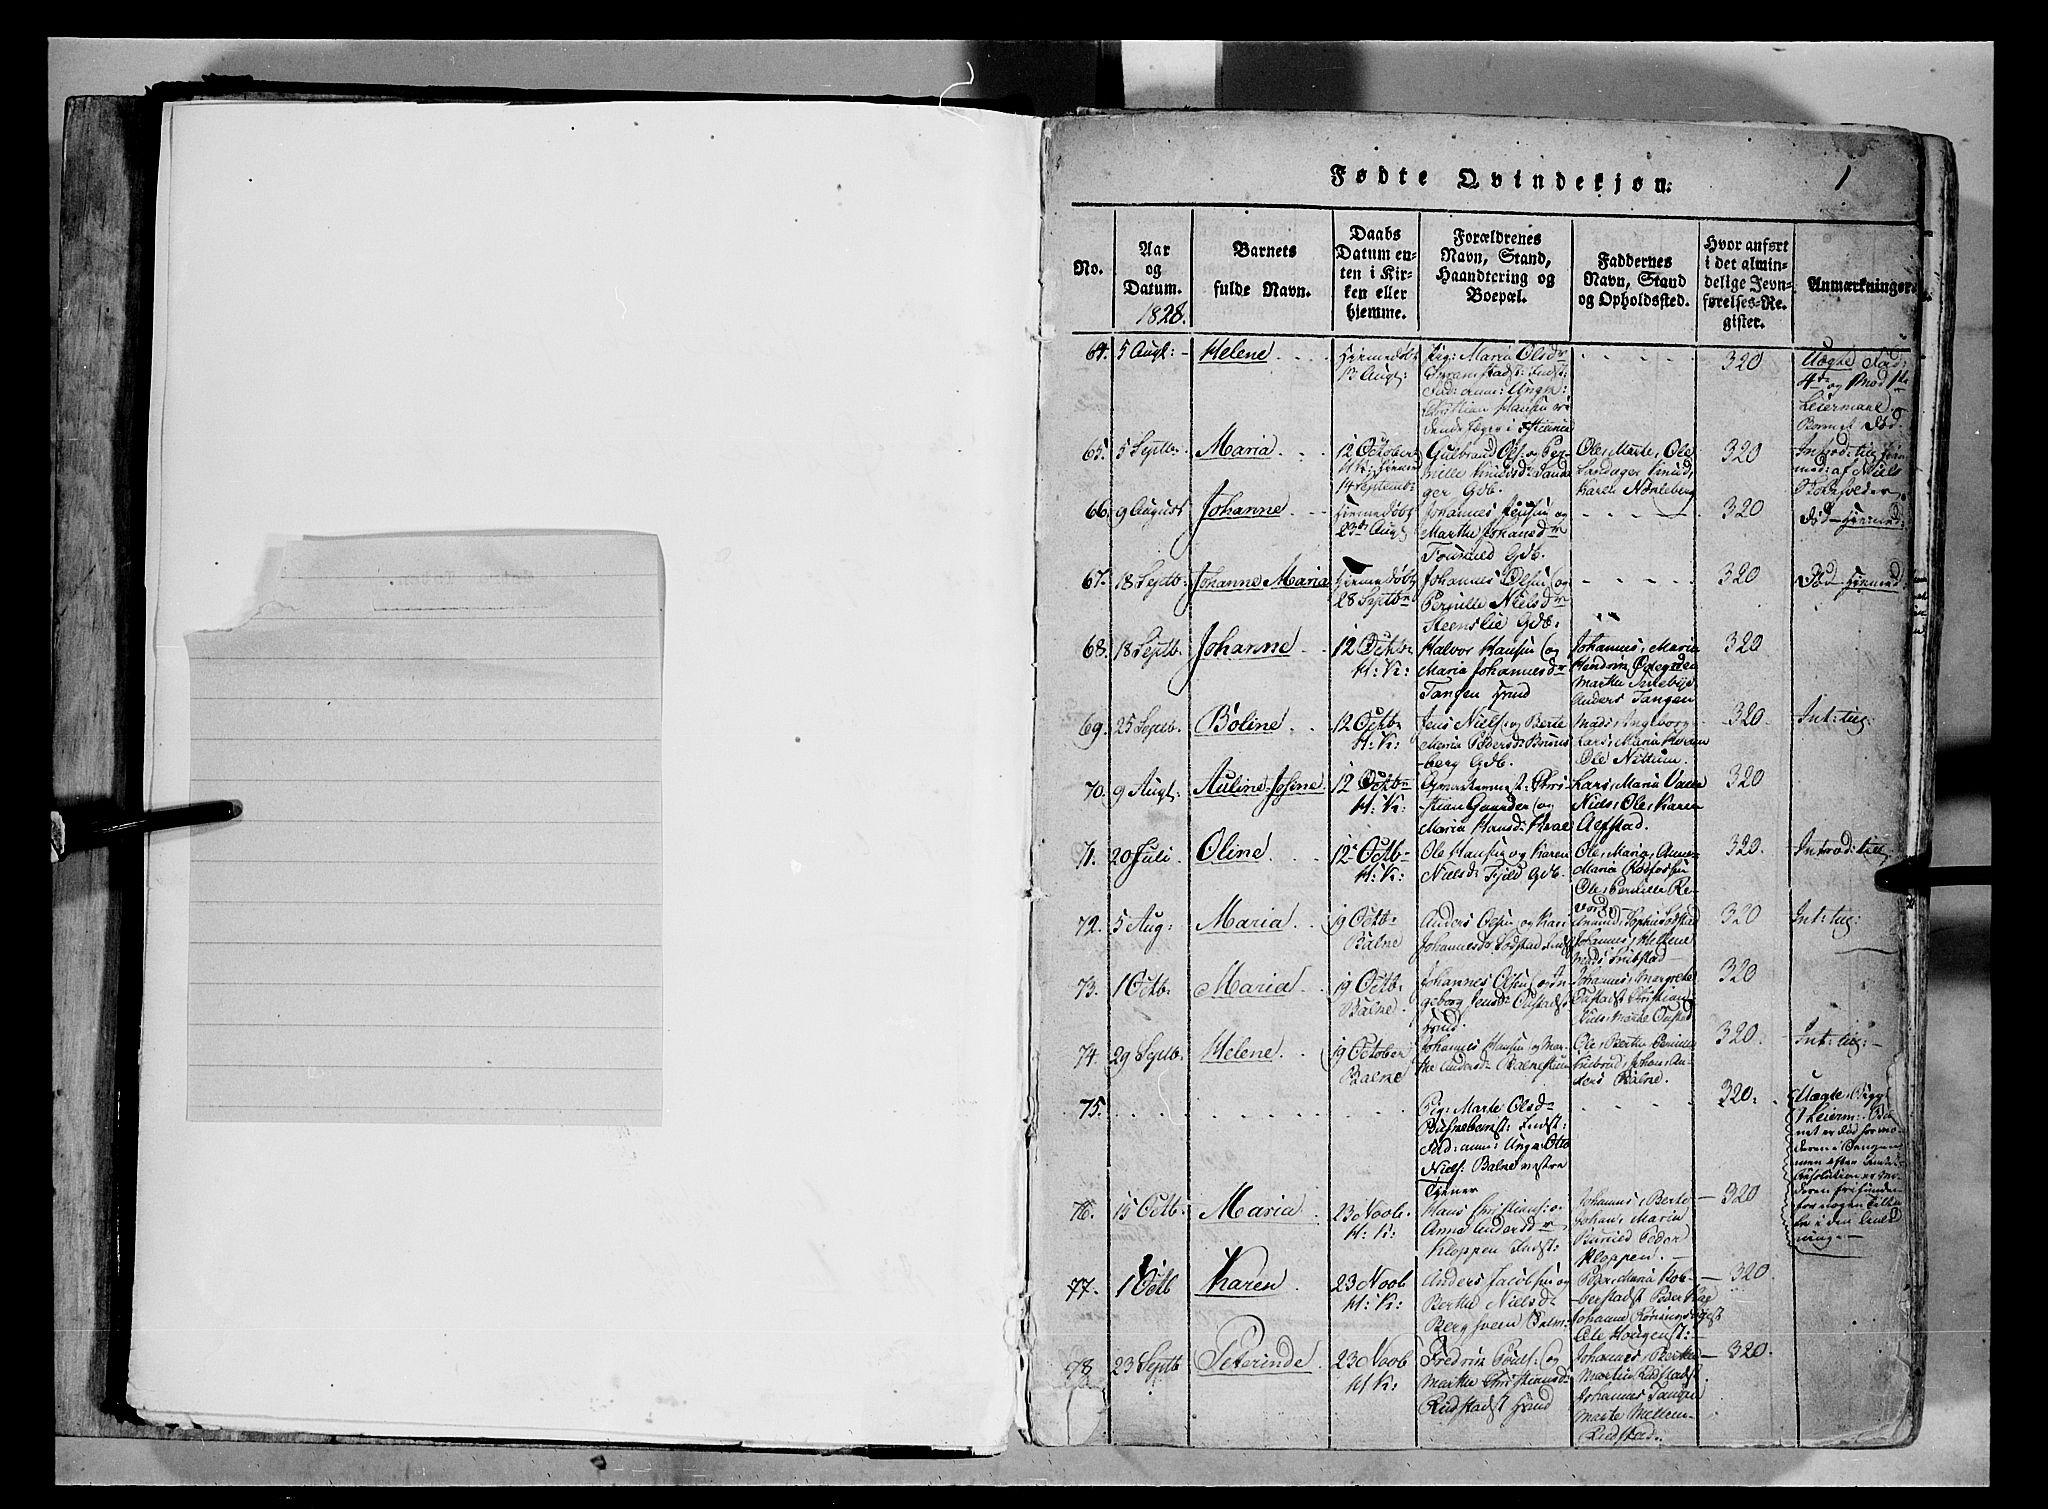 SAH, Østre Toten prestekontor, Ministerialbok nr. 1, 1828-1839, s. 1